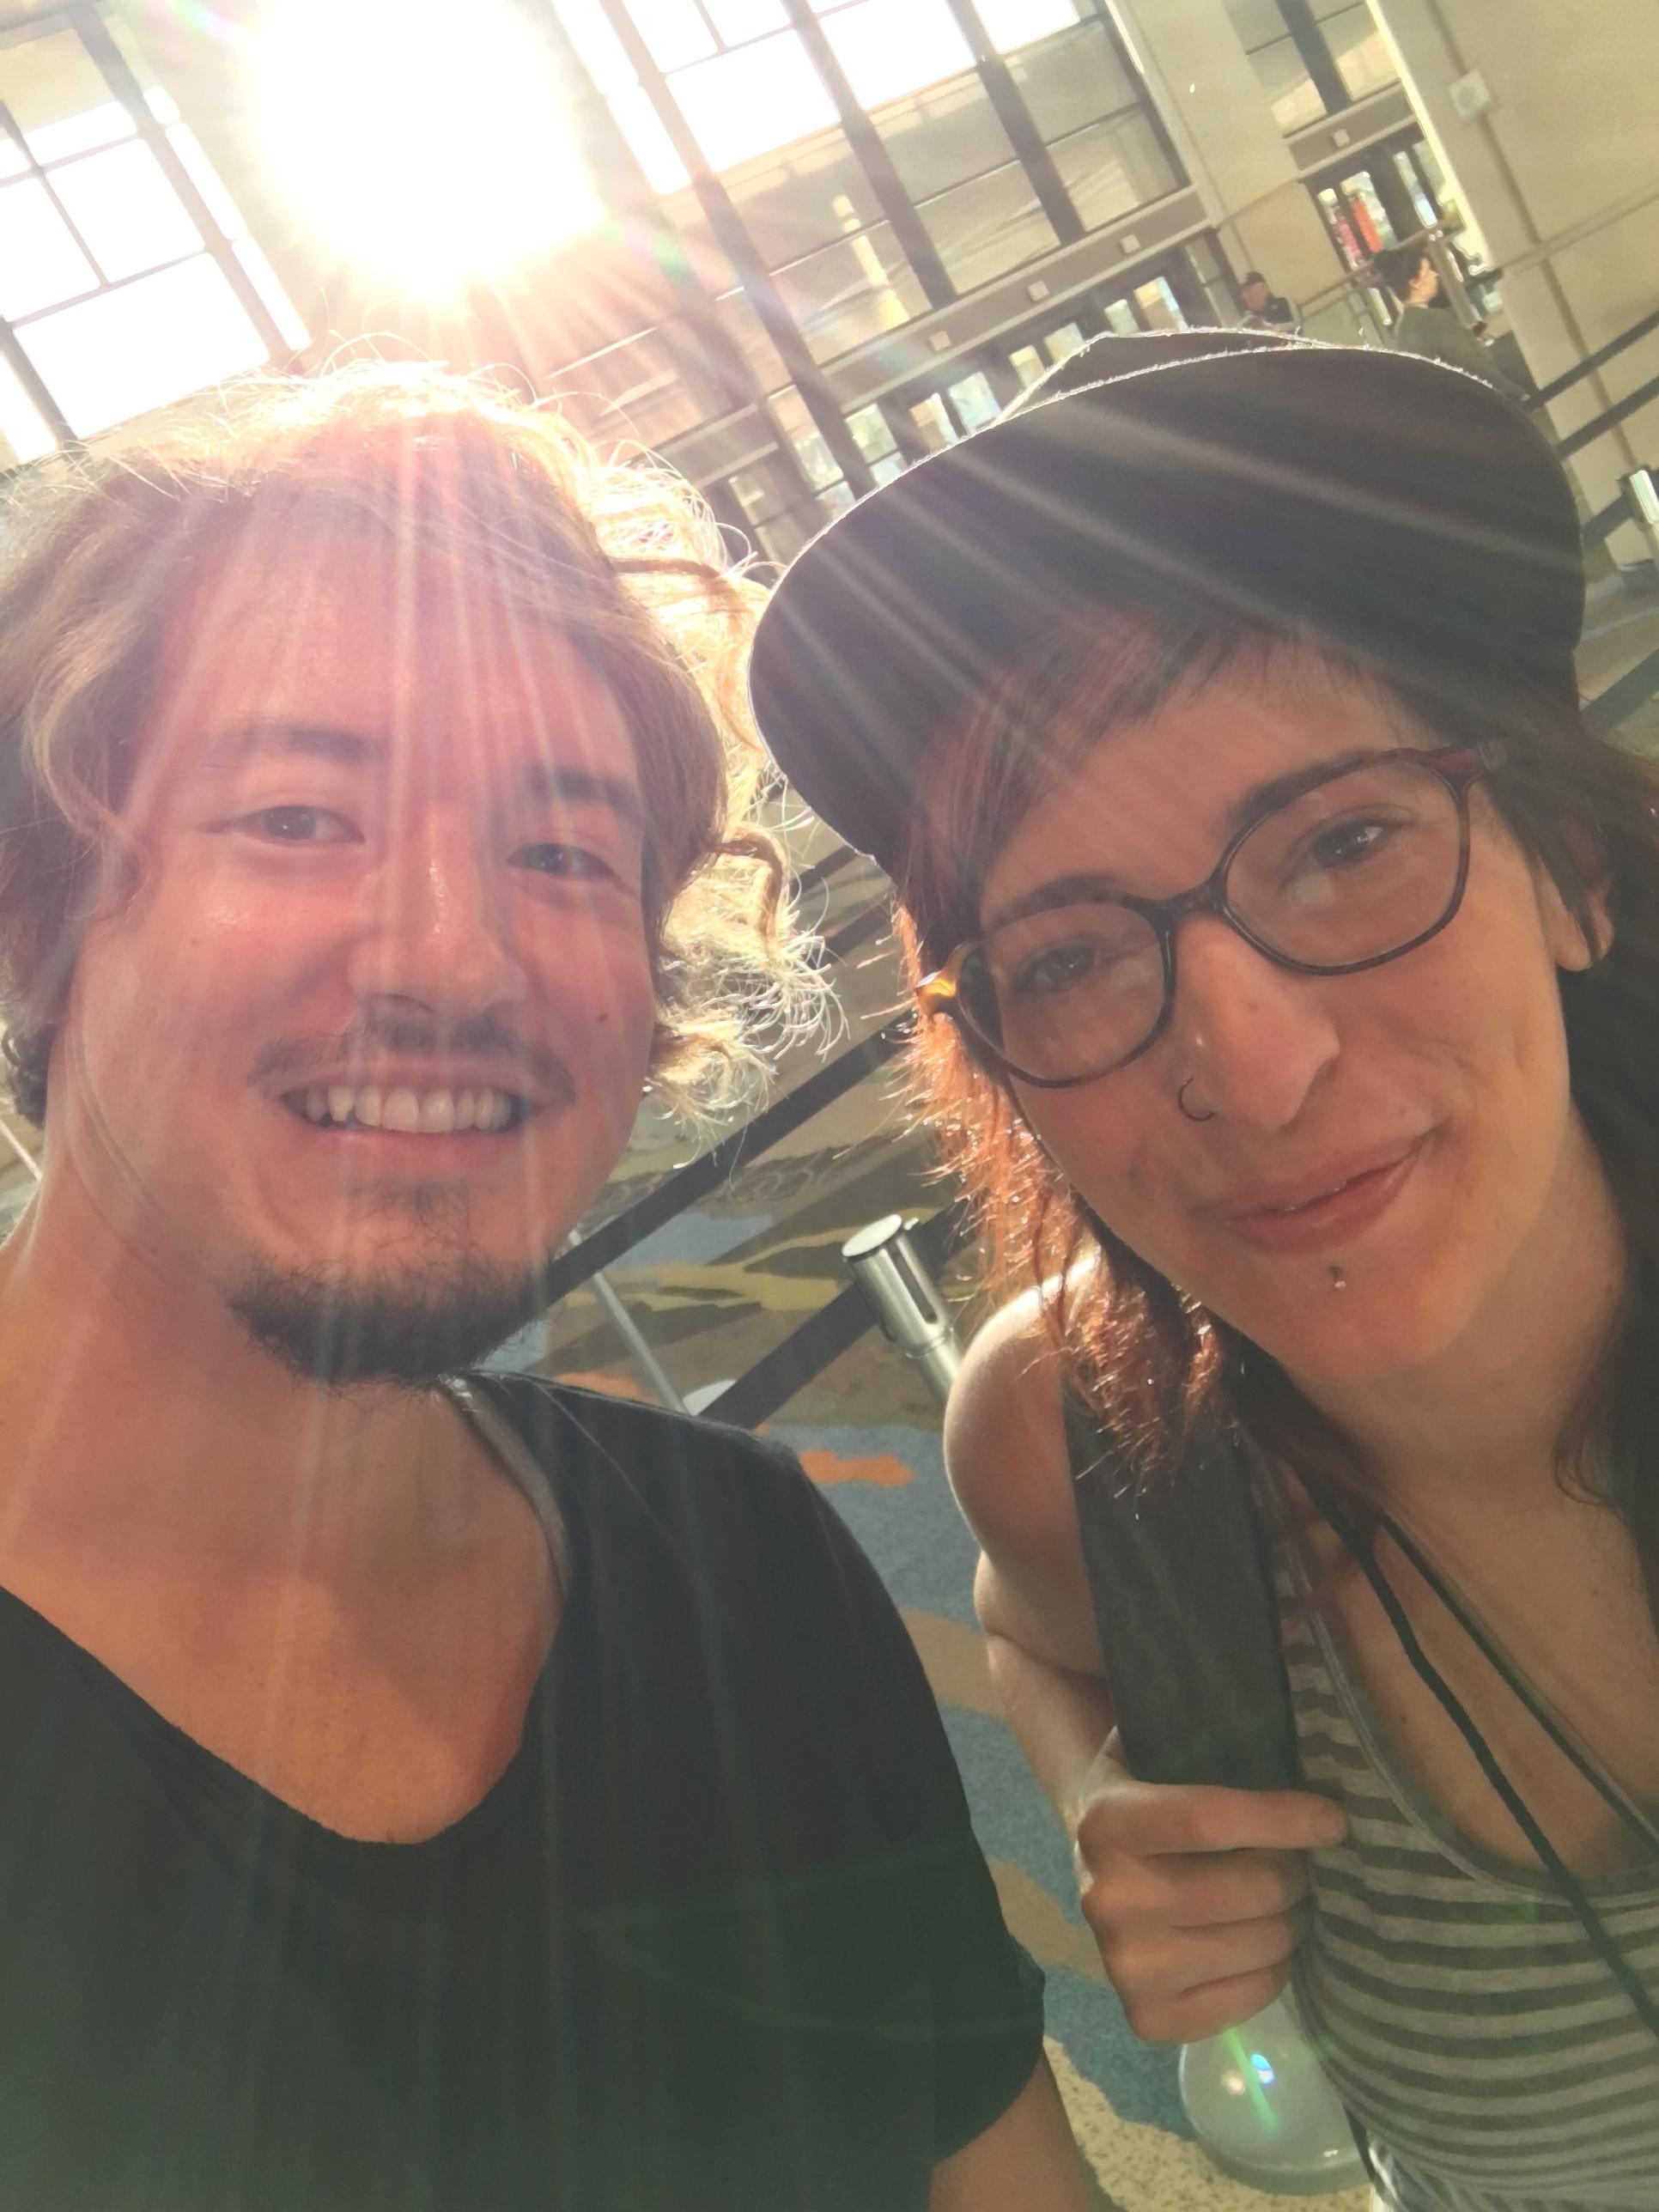 - Selfie with Jamie